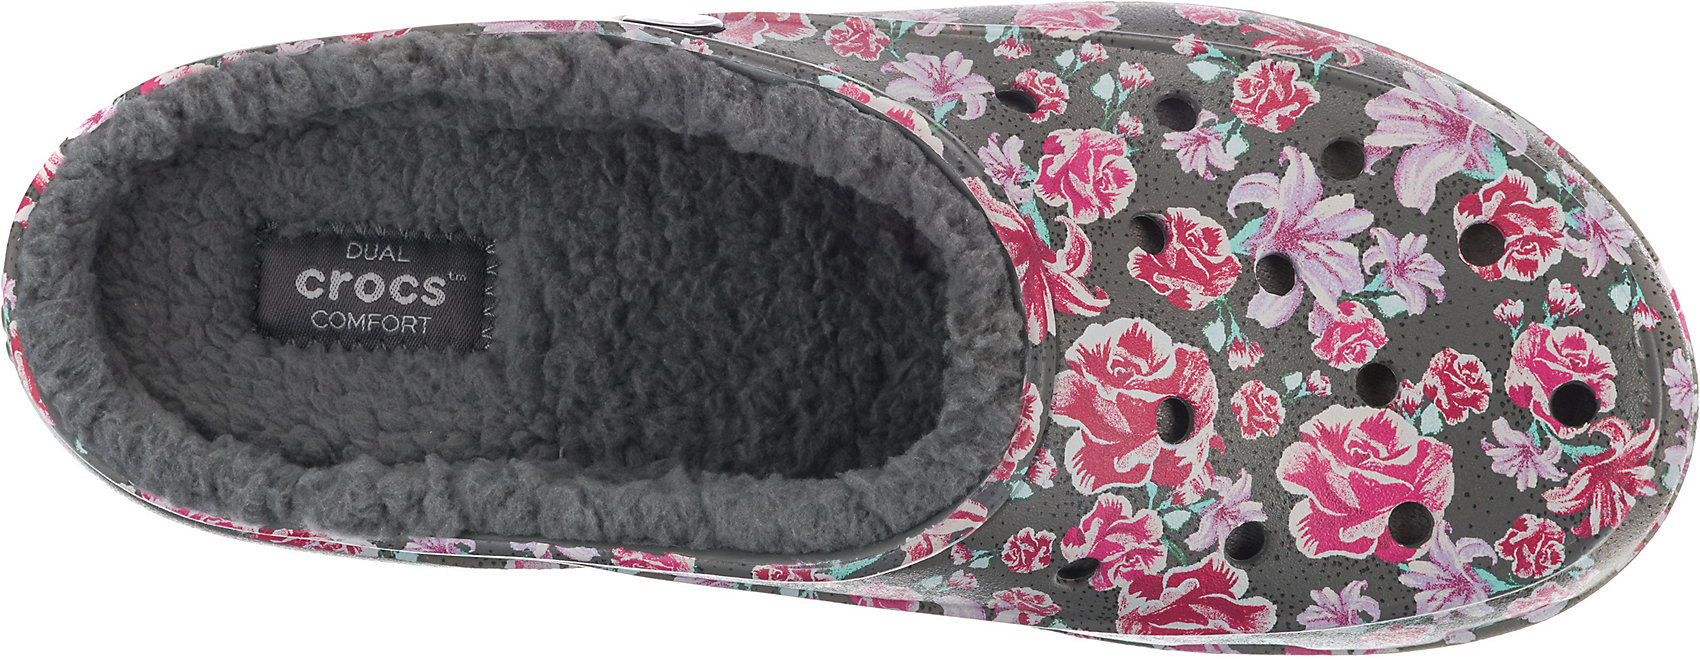 Neu Crocs Freesail Graphic Lined MFl//SGy Clogs 8745268 für Damen